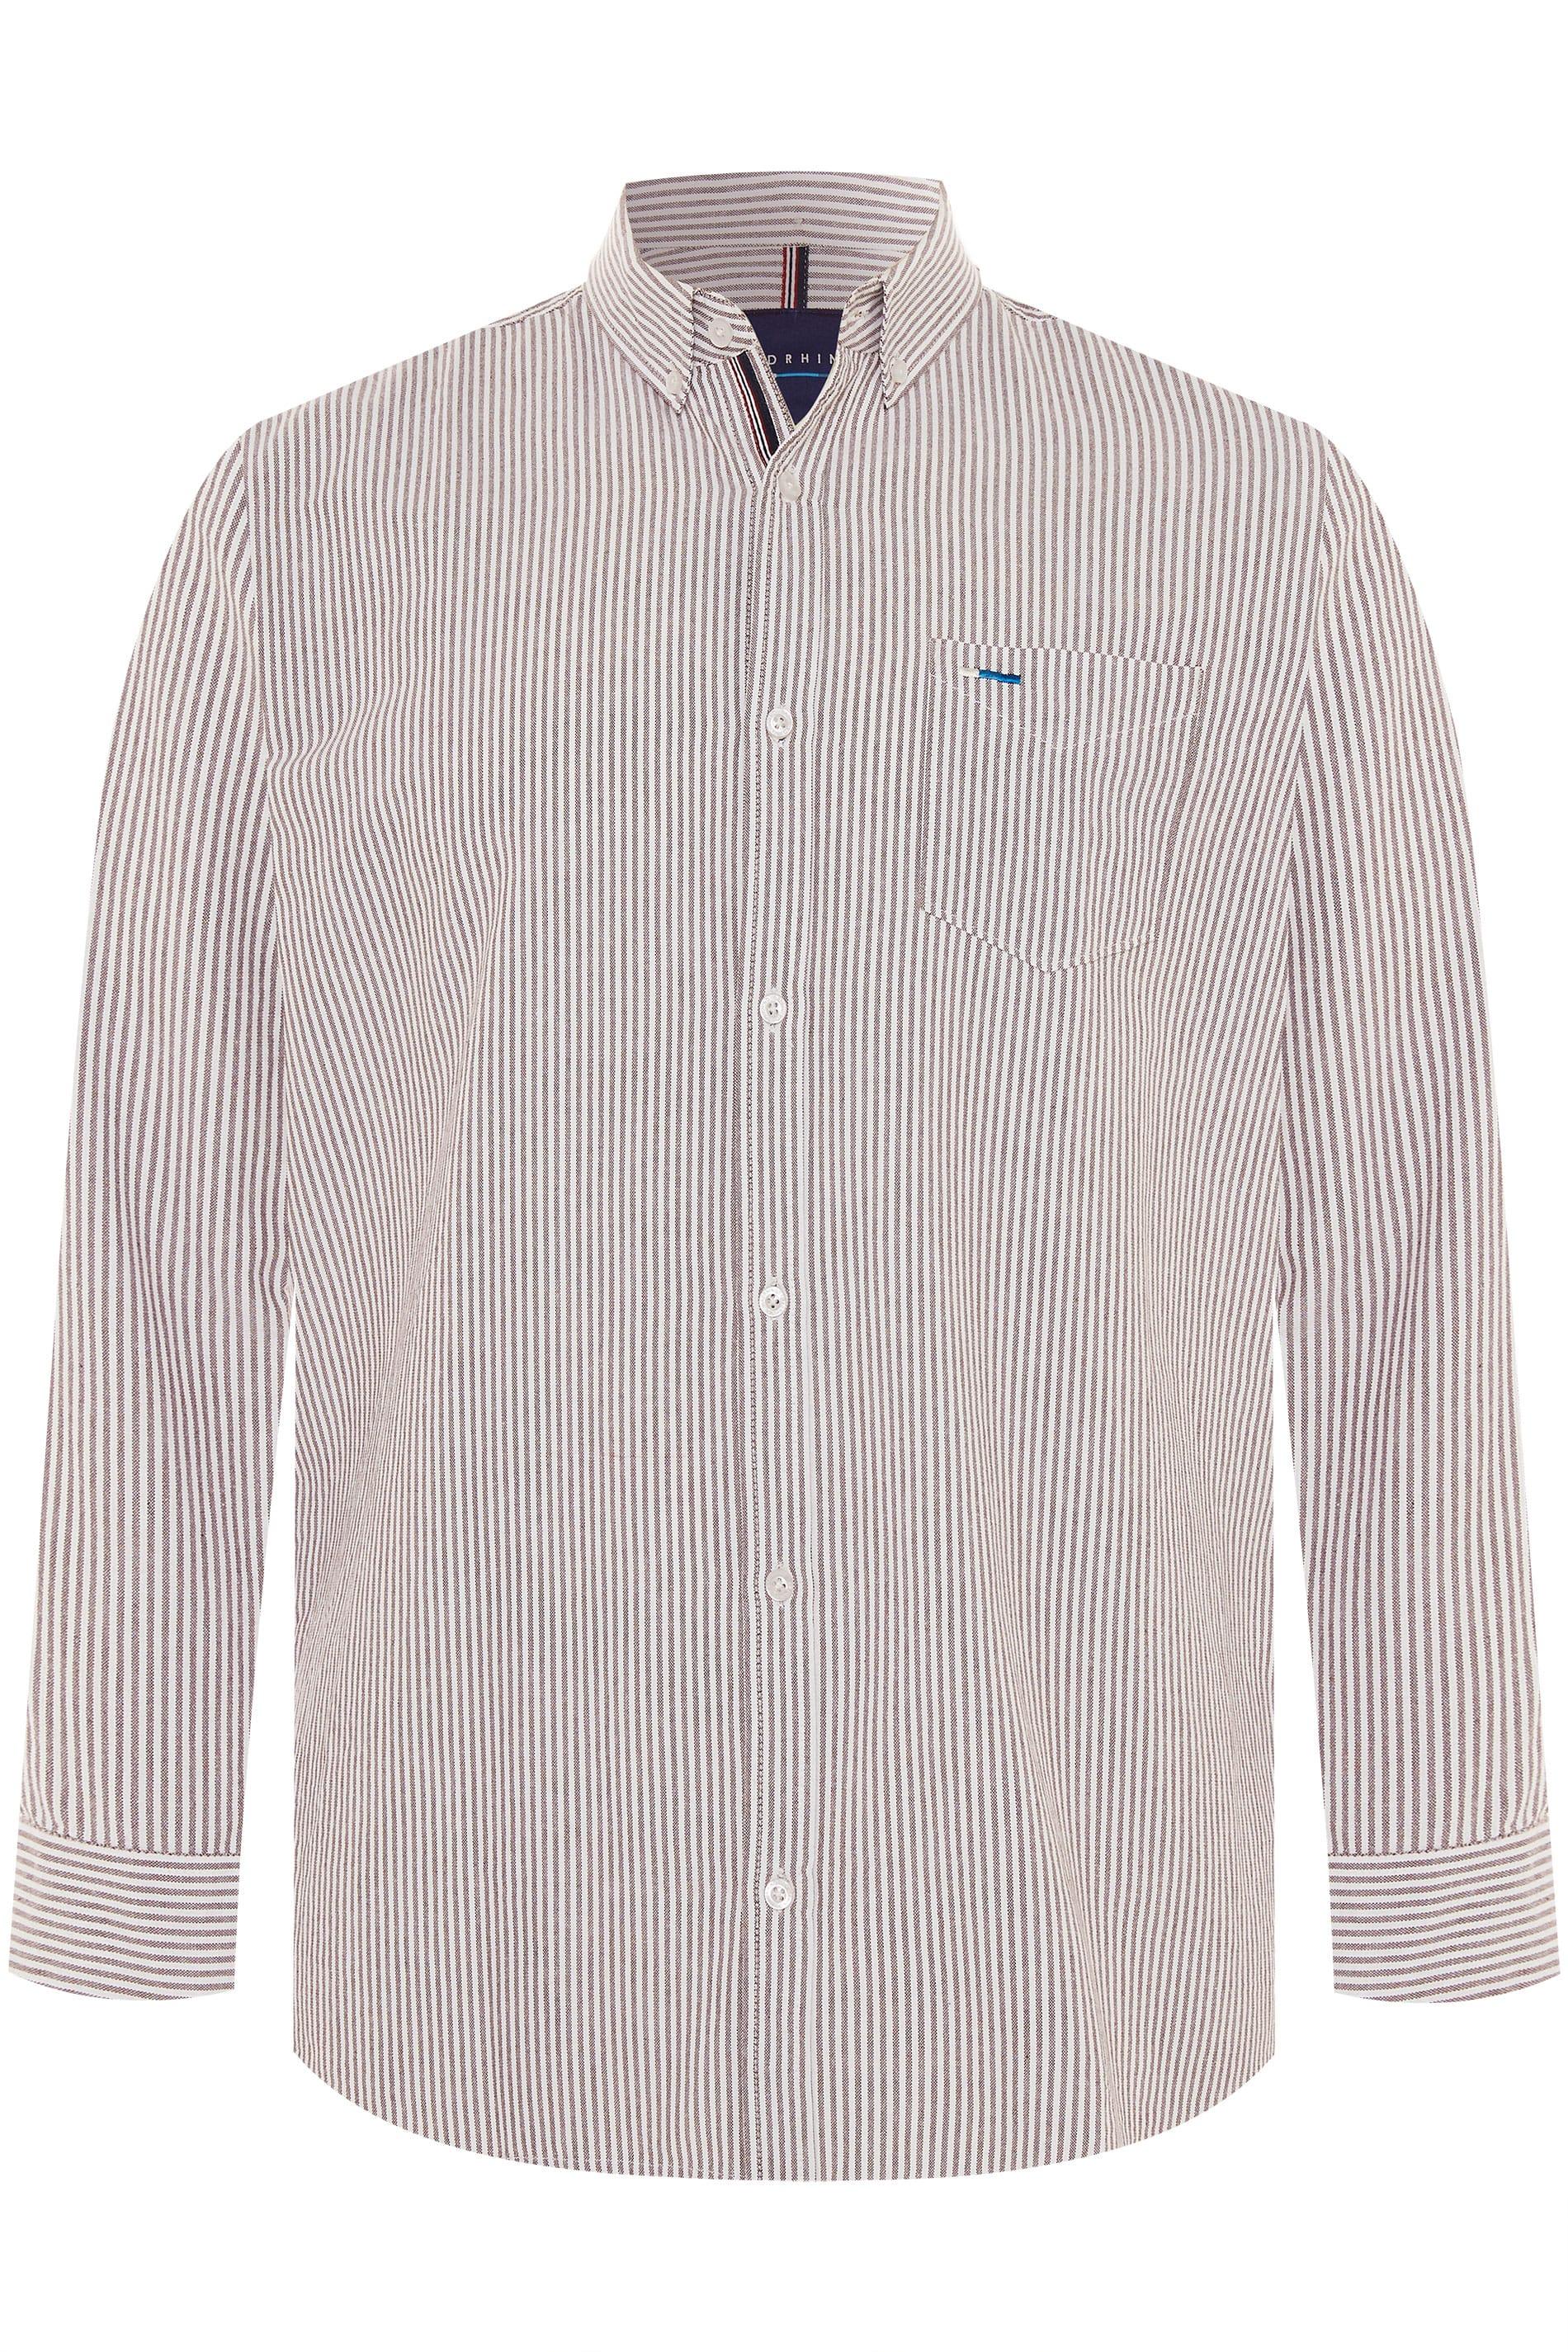 BadRhino Burgundy Striped Long Sleeved Oxford Shirt